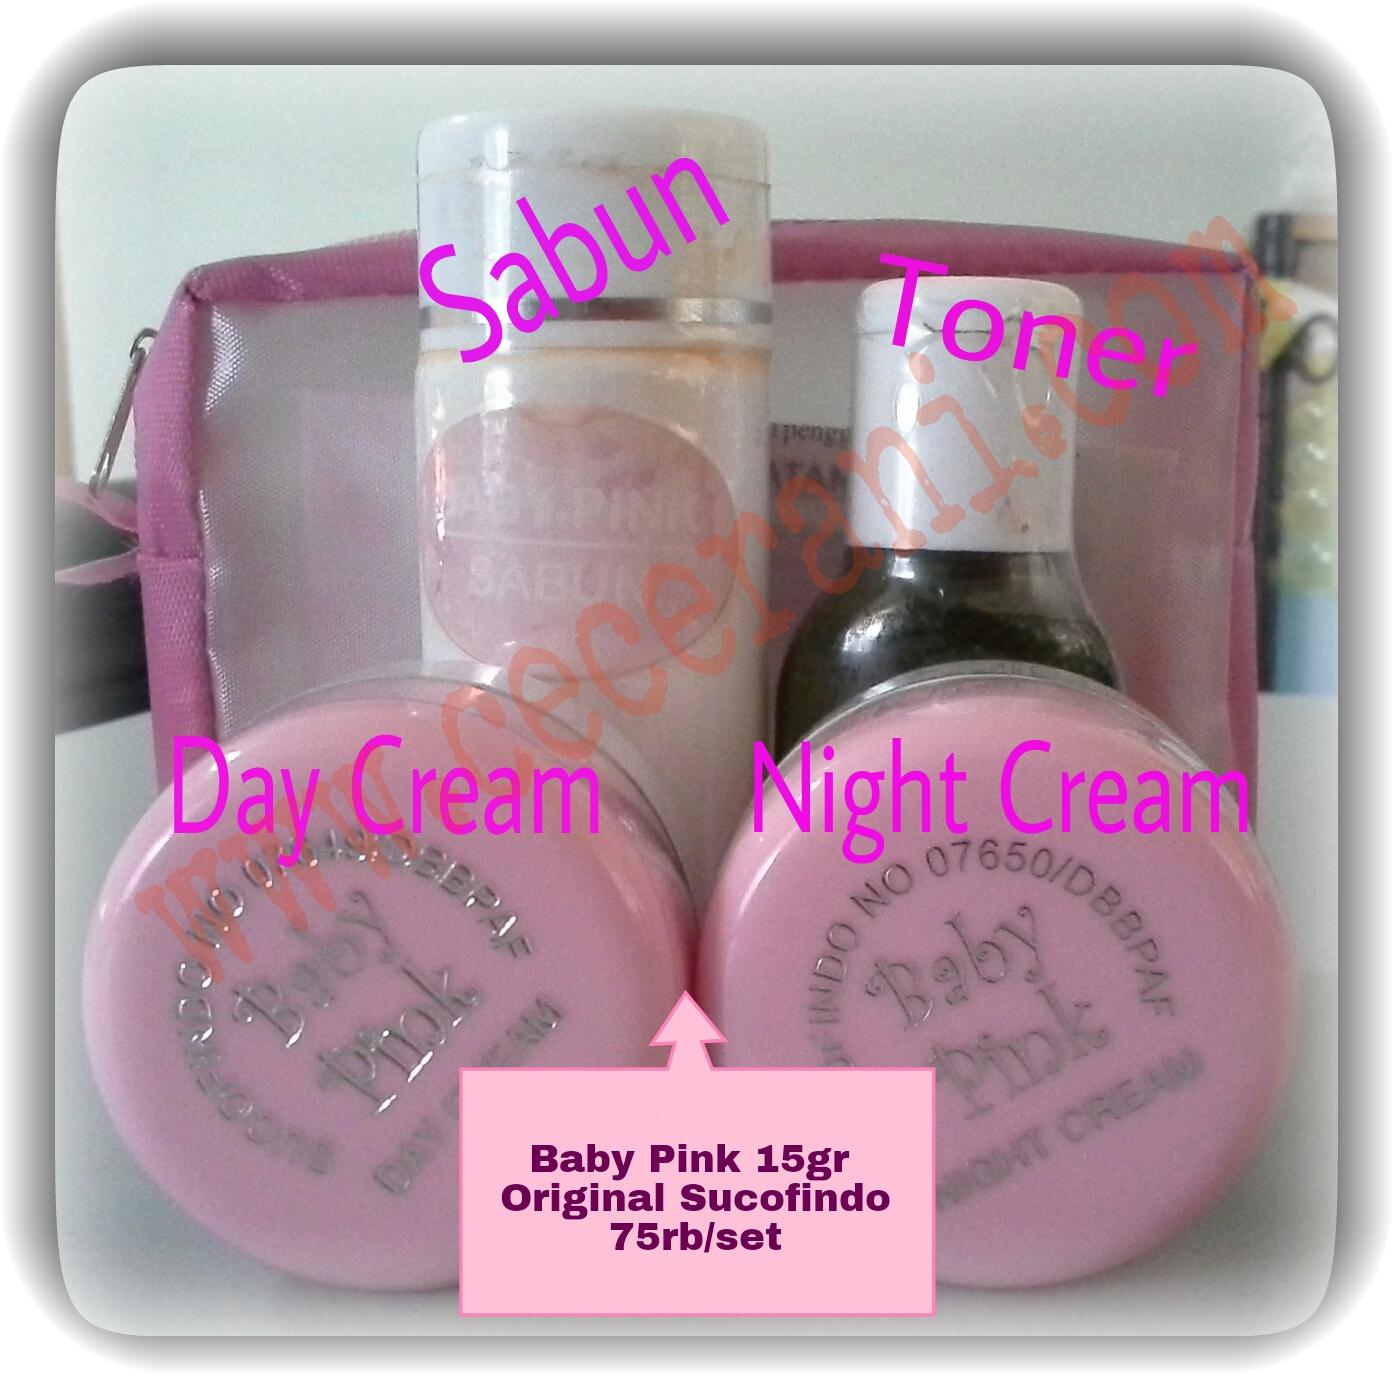 Baby Pink Cream Sucofindo Original 15 Gr Update Daftar Harga Babypink Emboss 15gr Plus Sertifikat Krim Embos Source